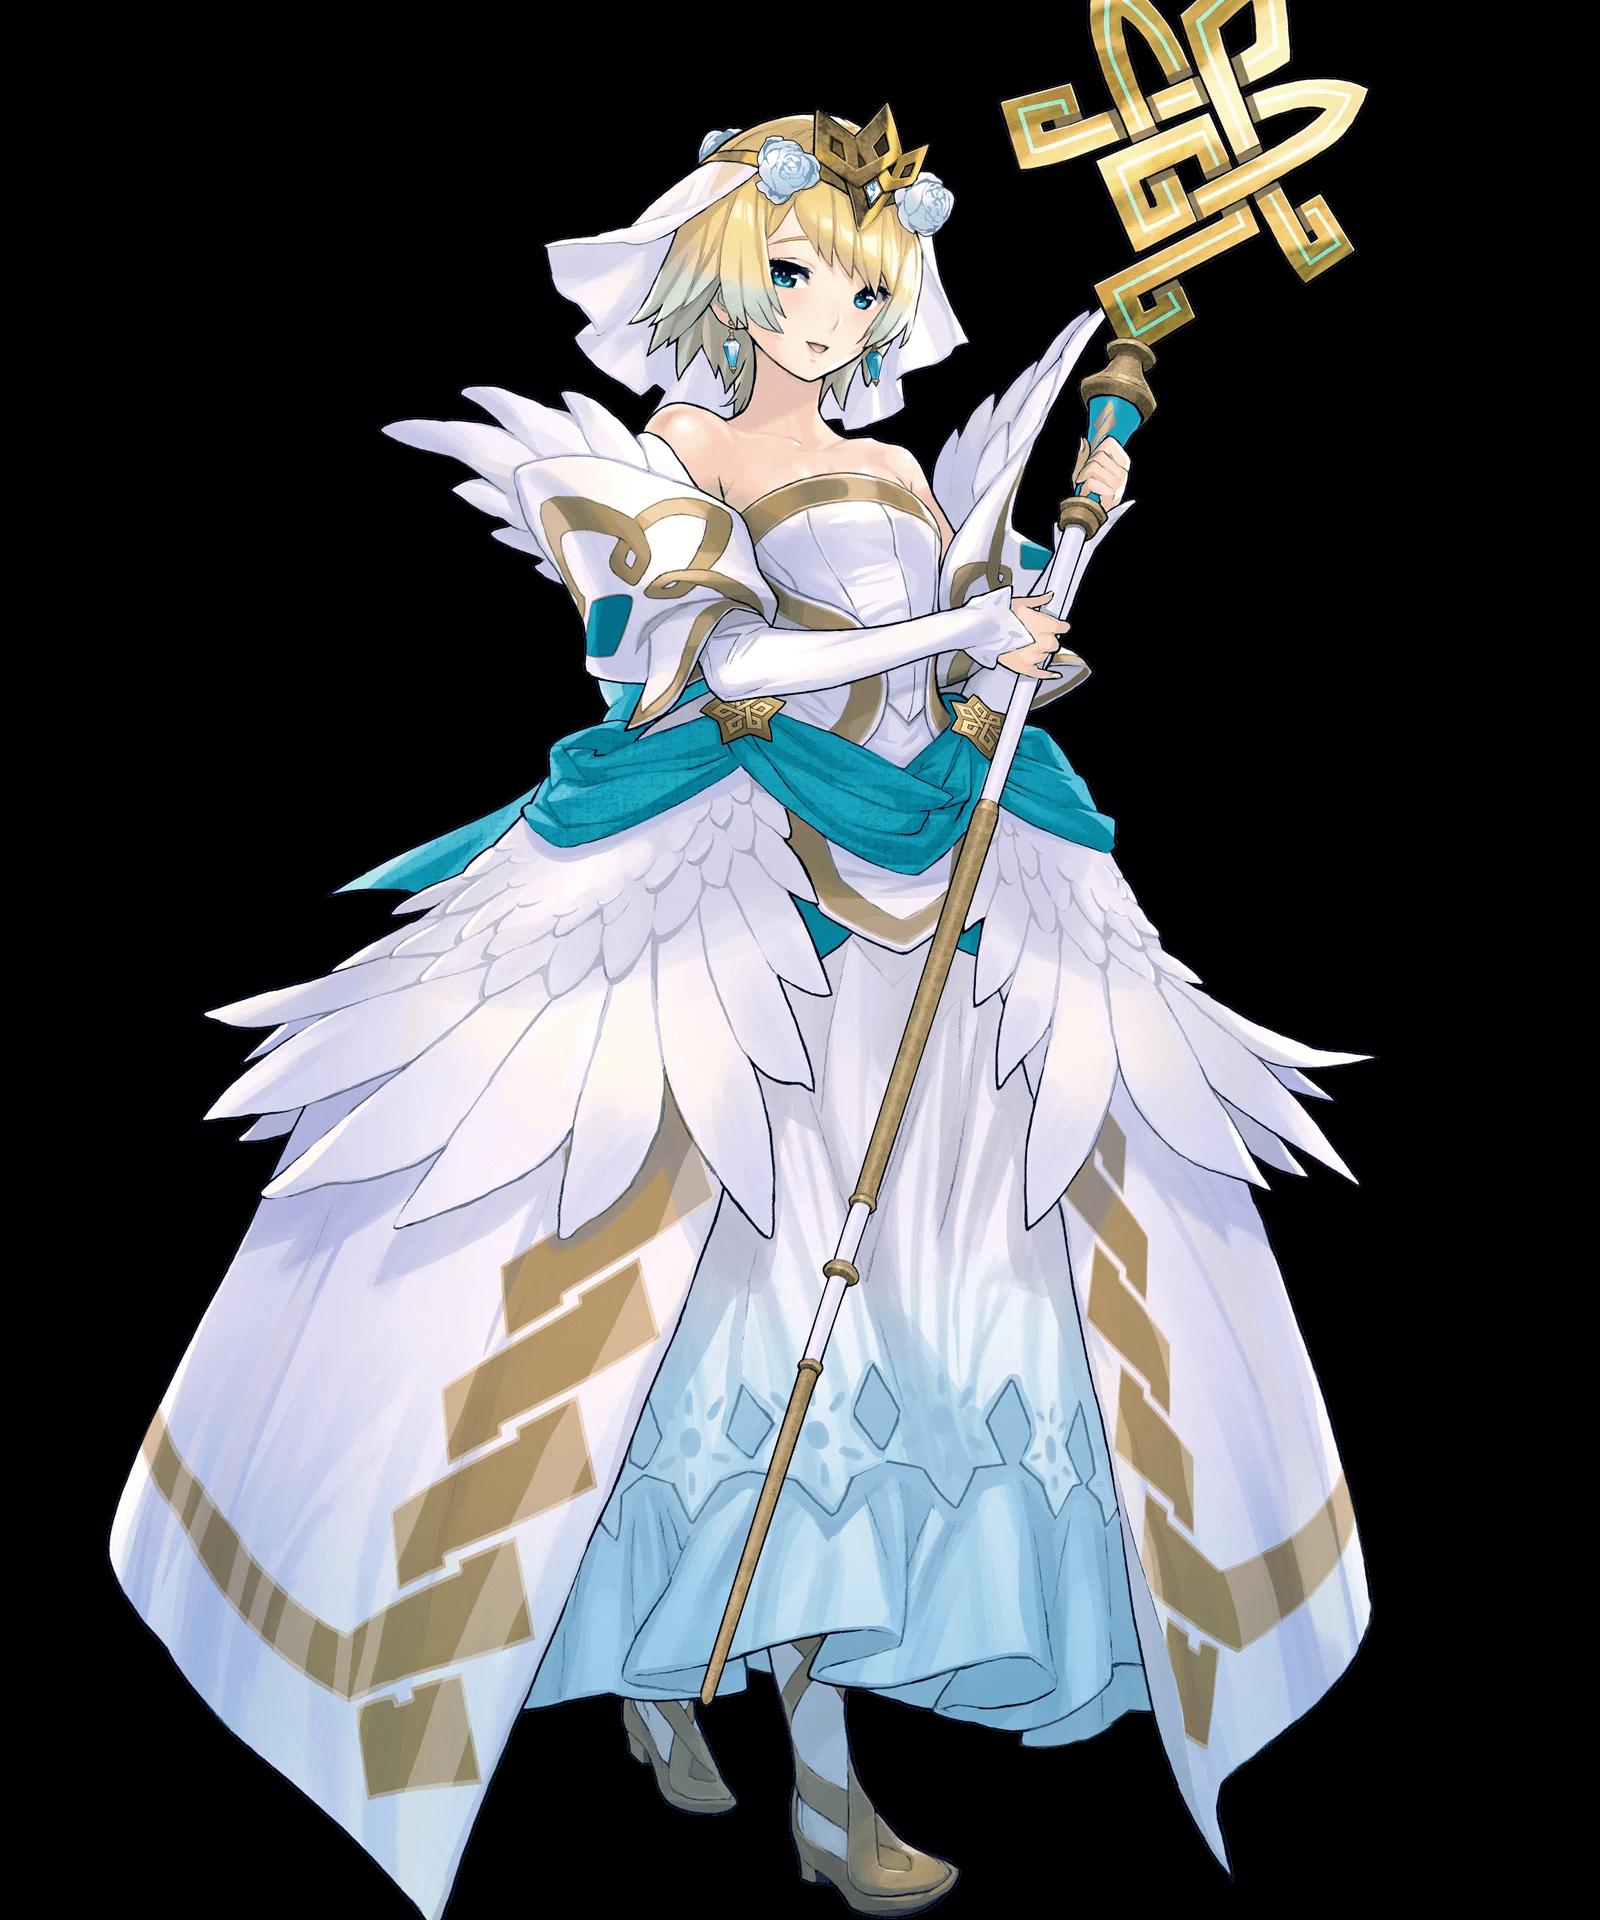 Fire Emblem Heroes Summoning Event for Azura: Vallite